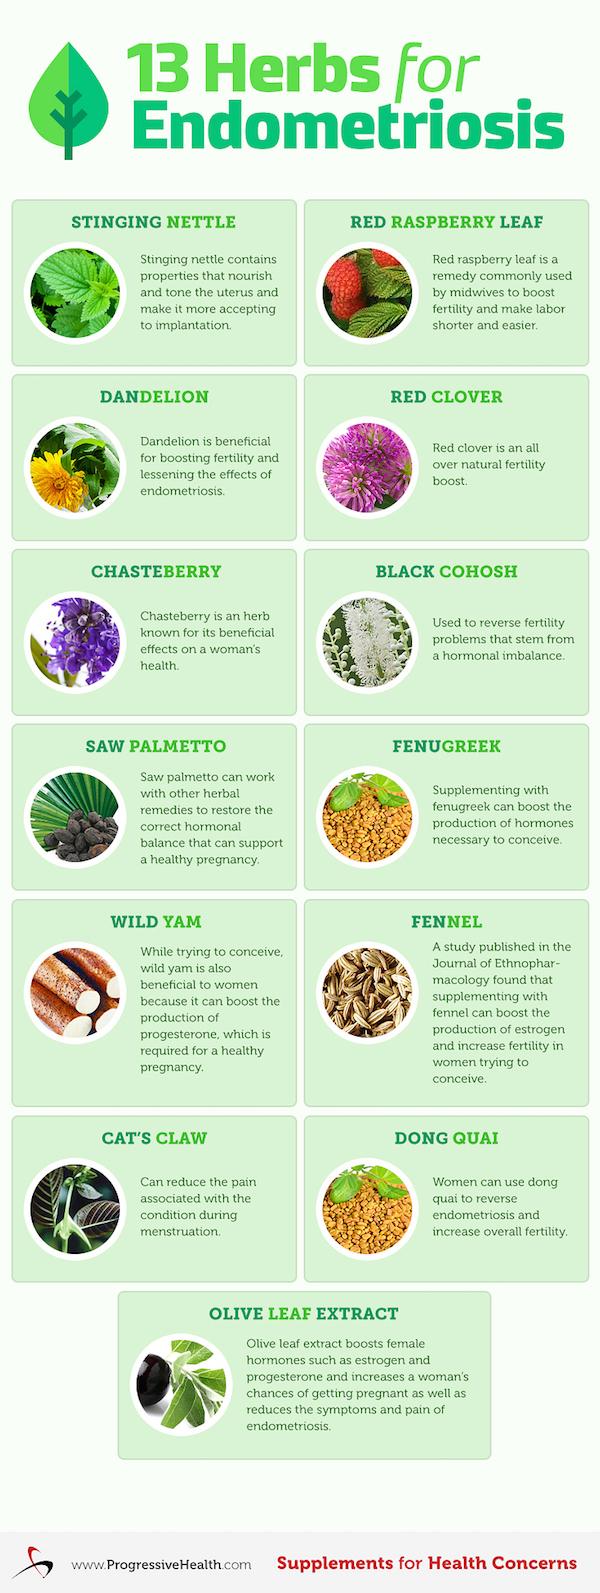 13 Herbs for Endometriosis